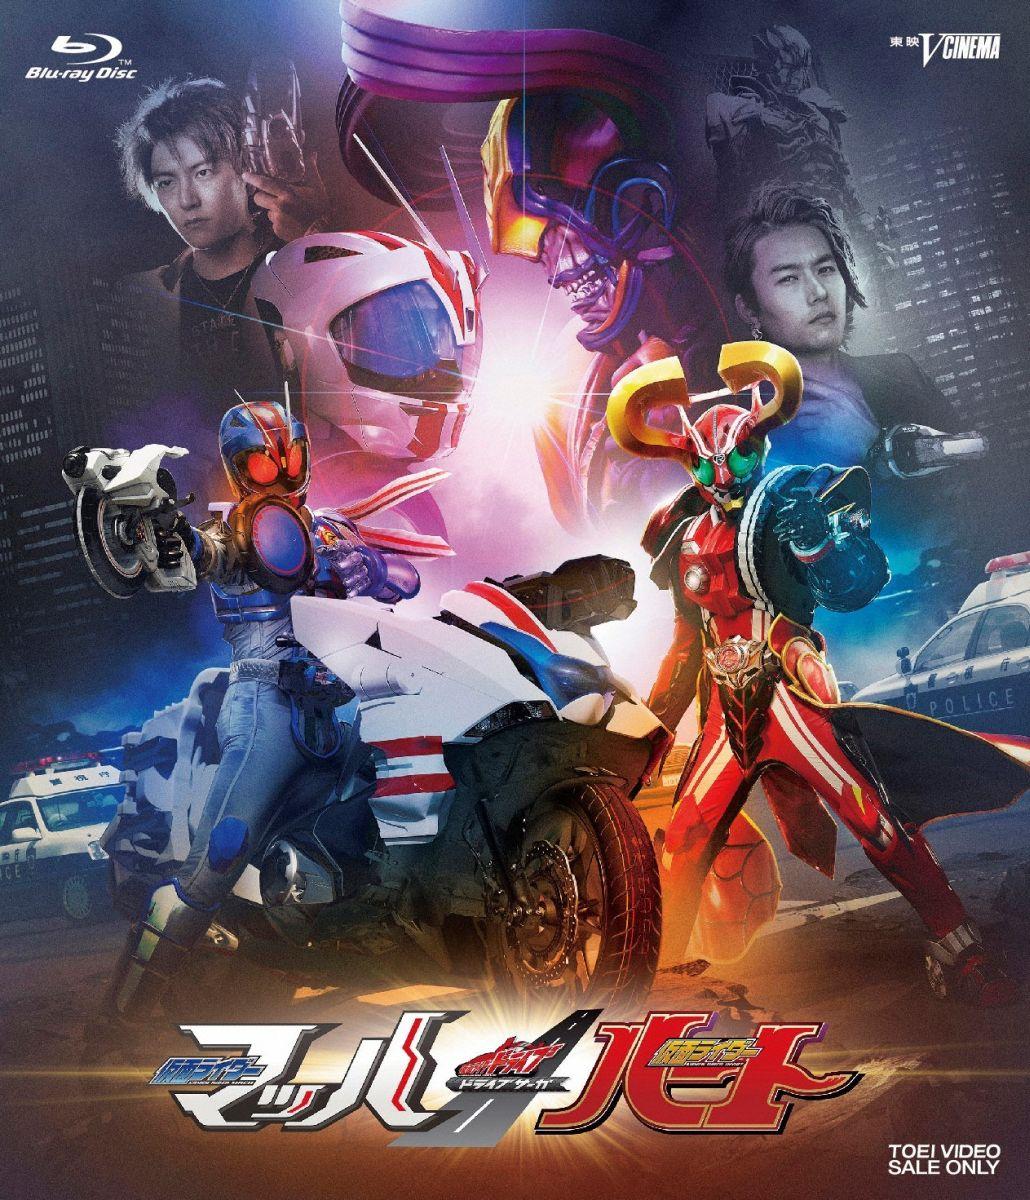 Kamen Rider heart Blu-ray